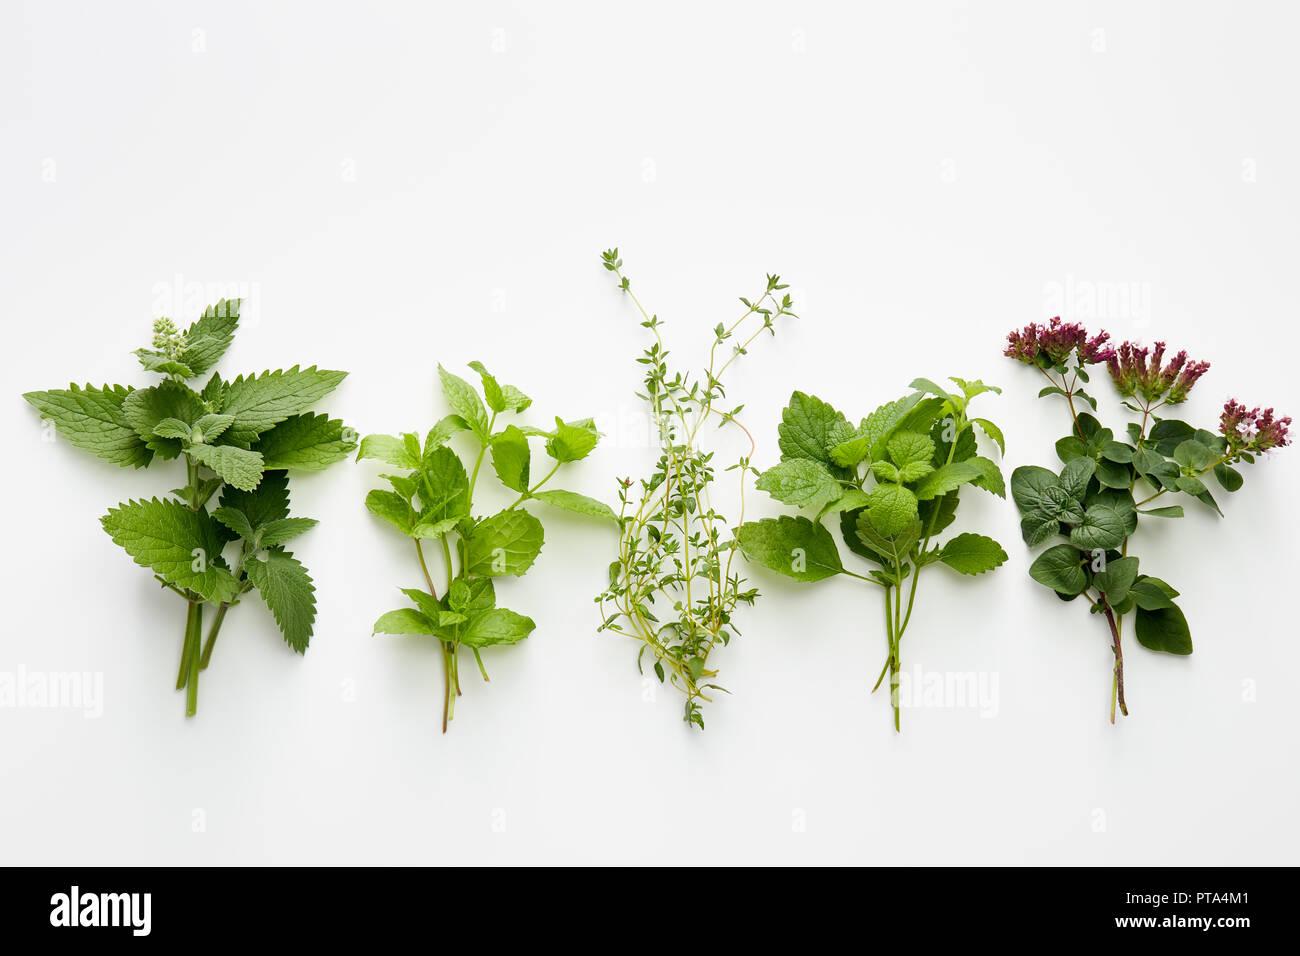 Assortment of fresh herbs (catnip, mint, thym, lemon balm and oregano) on white background. - Stock Image